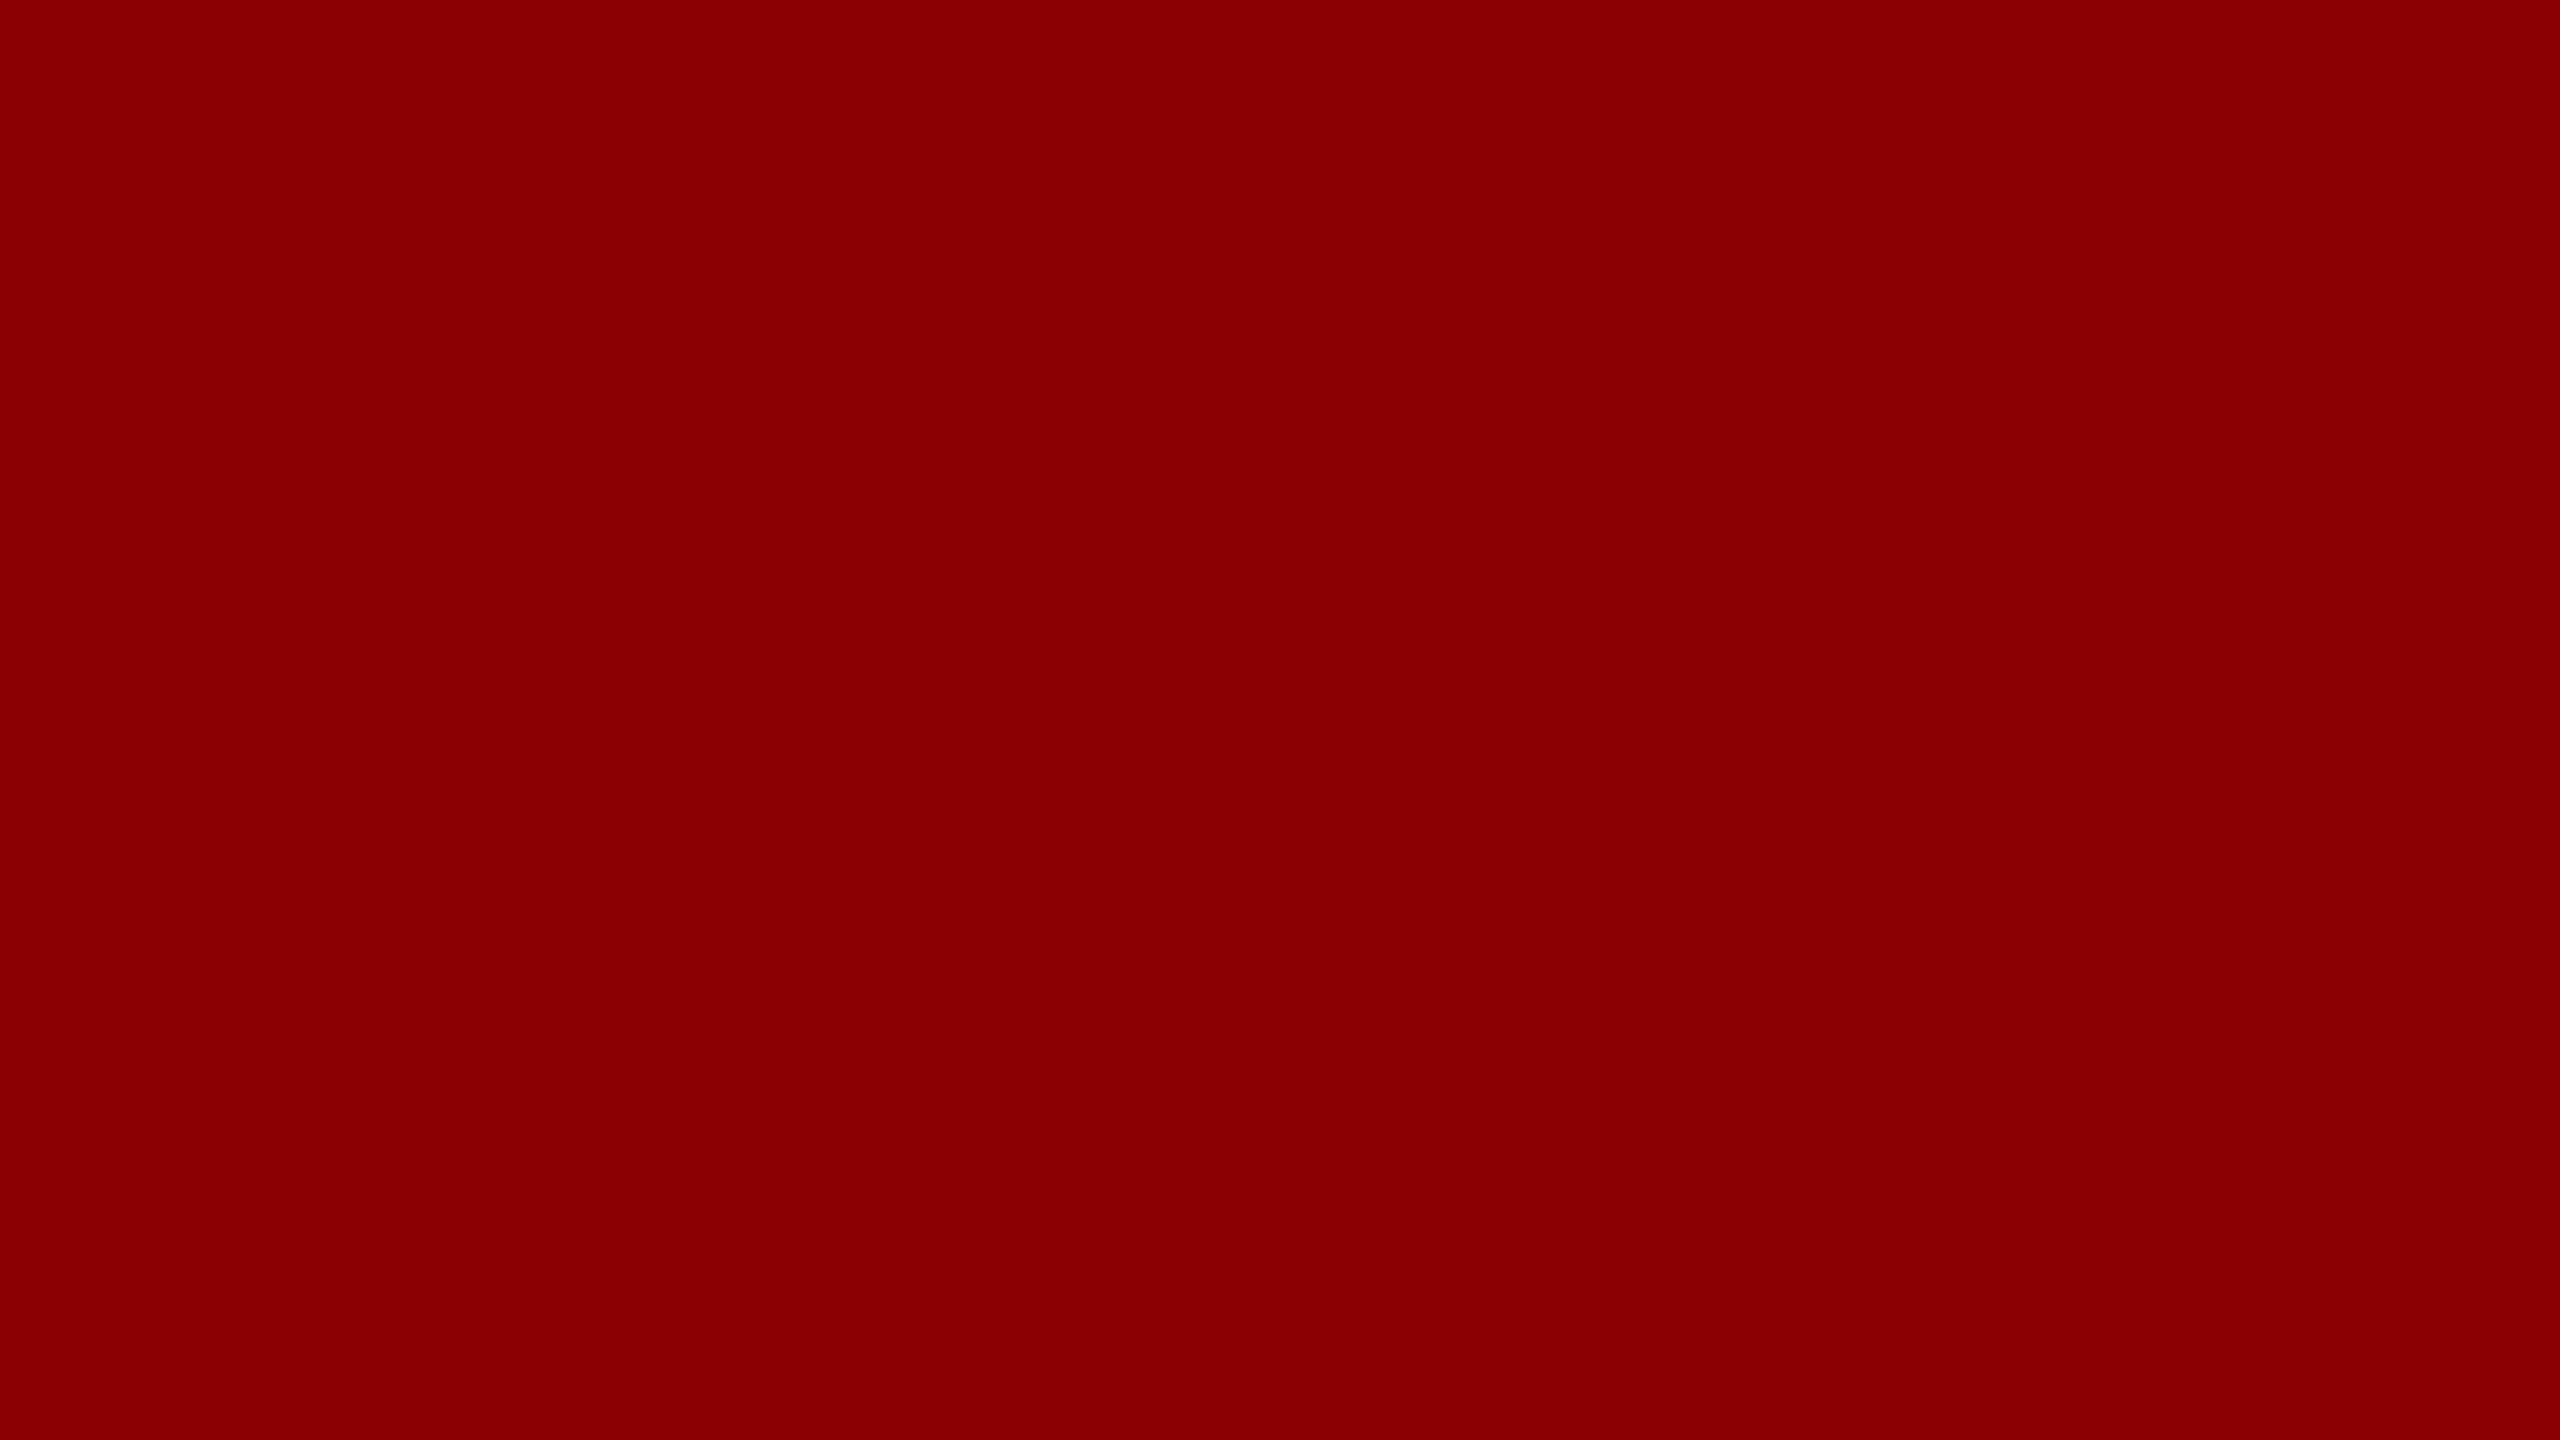 Dark Red Background - WallpaperSafari